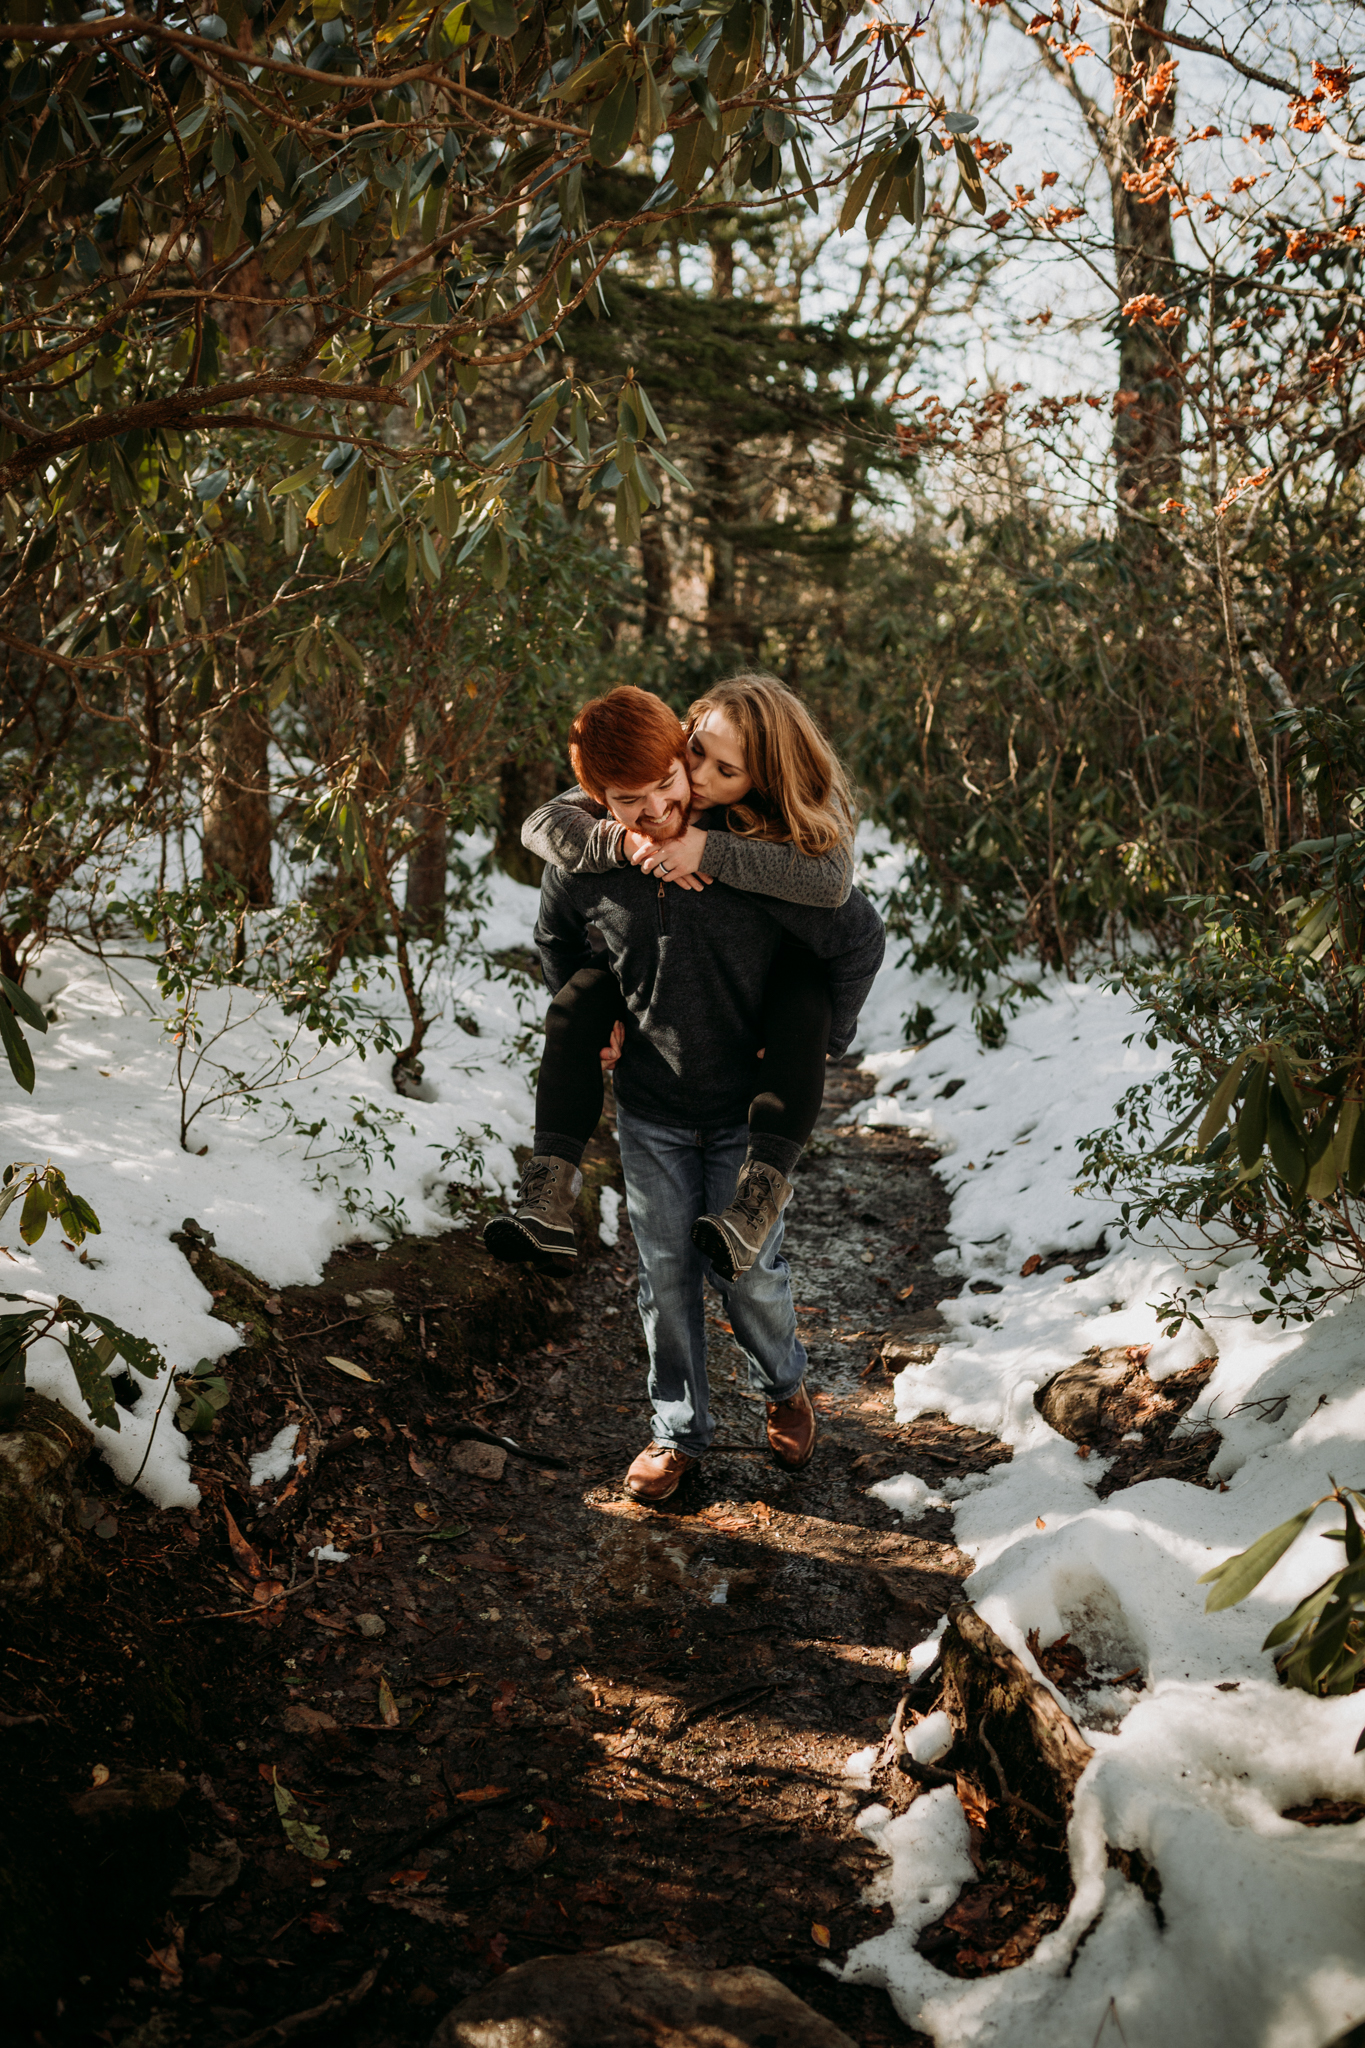 MonicaLeavellPhoto-AshleyMitch-NorthCarolina-Adventure-Engagement-Photographer-9.jpg